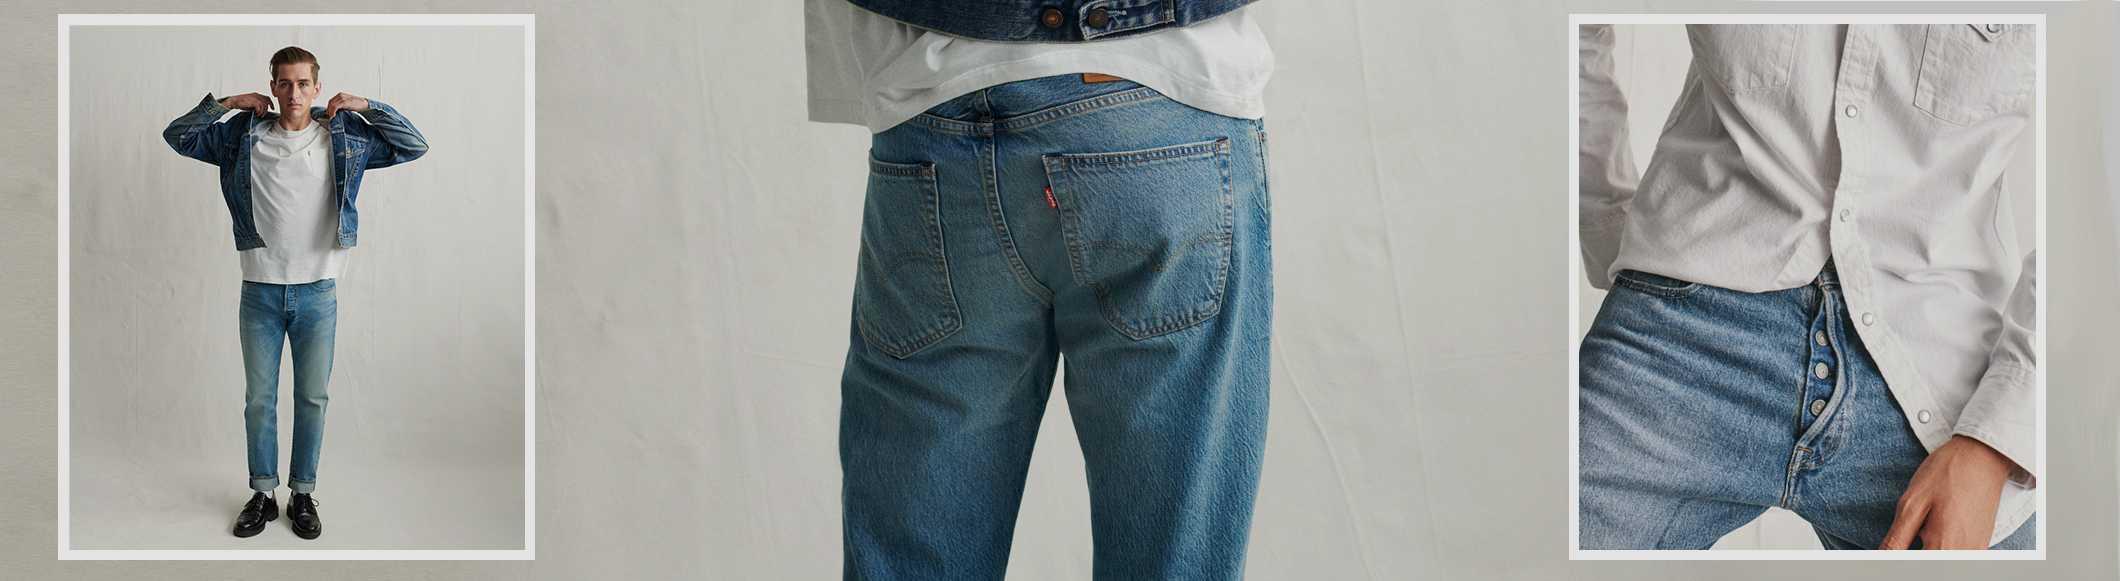 3984e4a38 Men's Shrink-to-fit™ 501® Jeans | Levi's® US